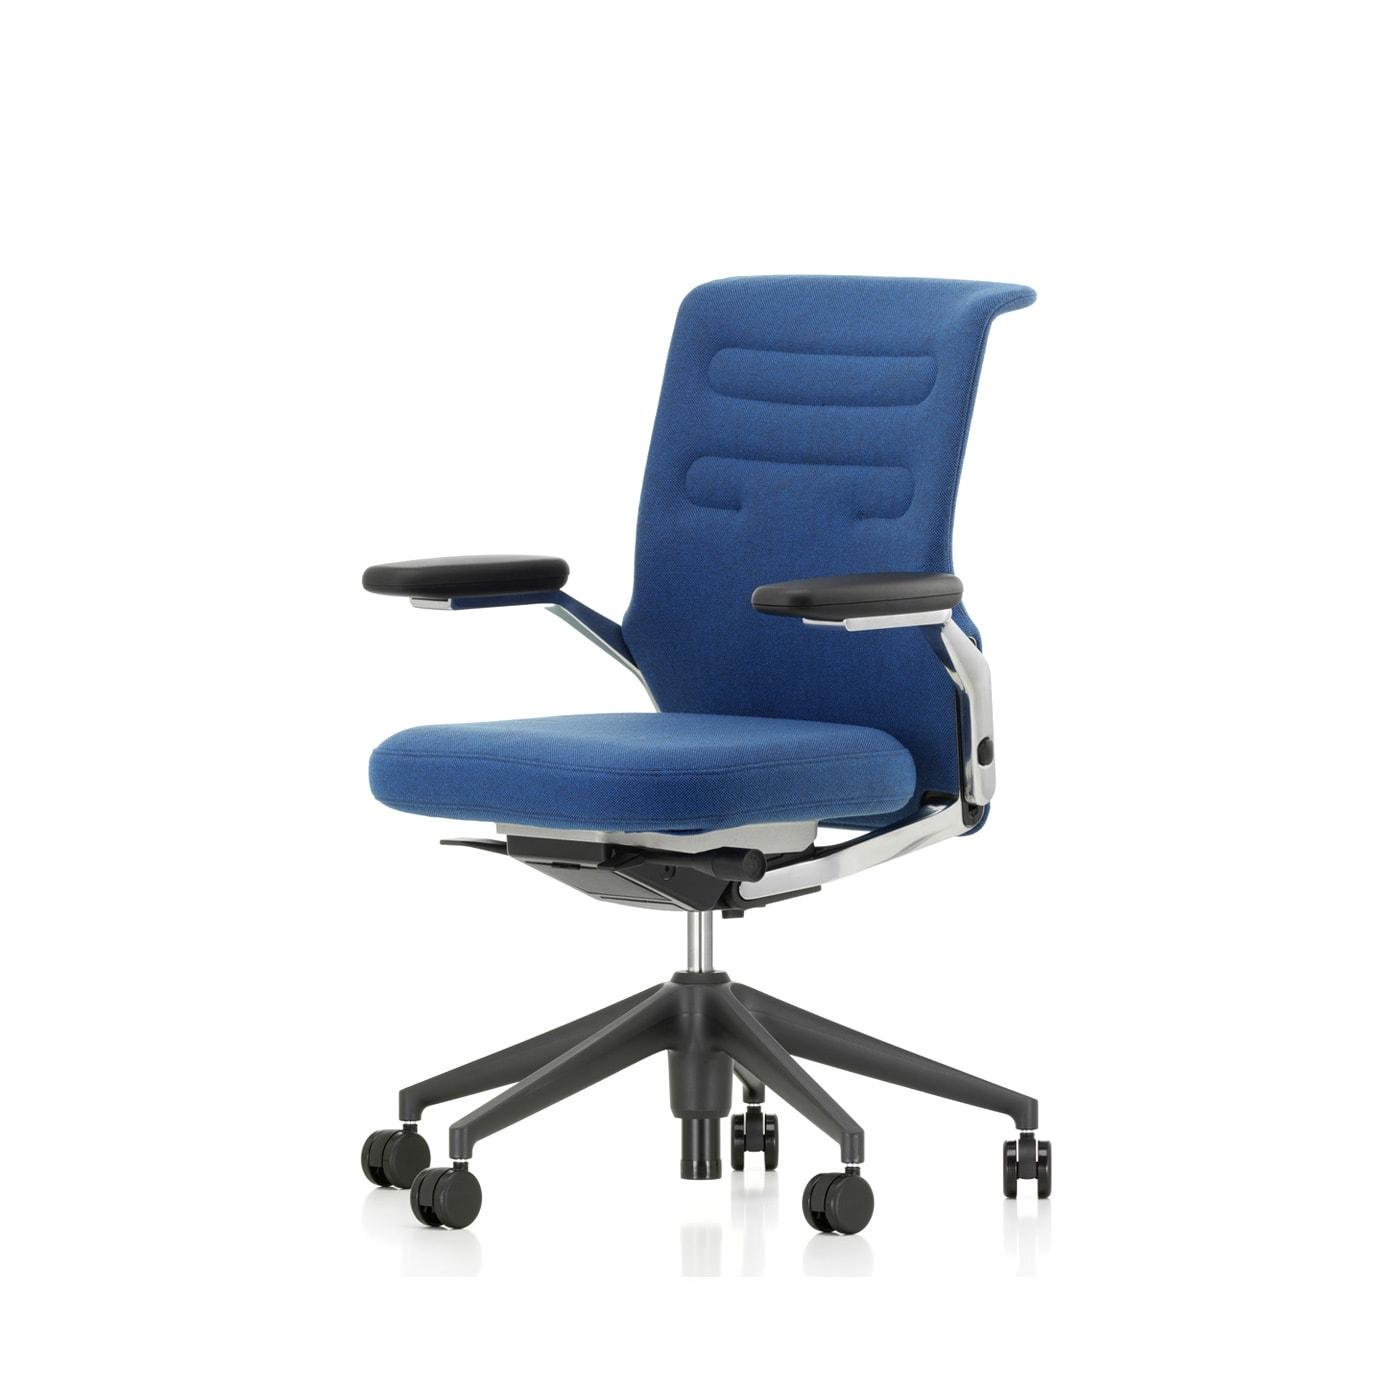 Vitra AC5 Work lowback sedia ufficio braccioli regolabili